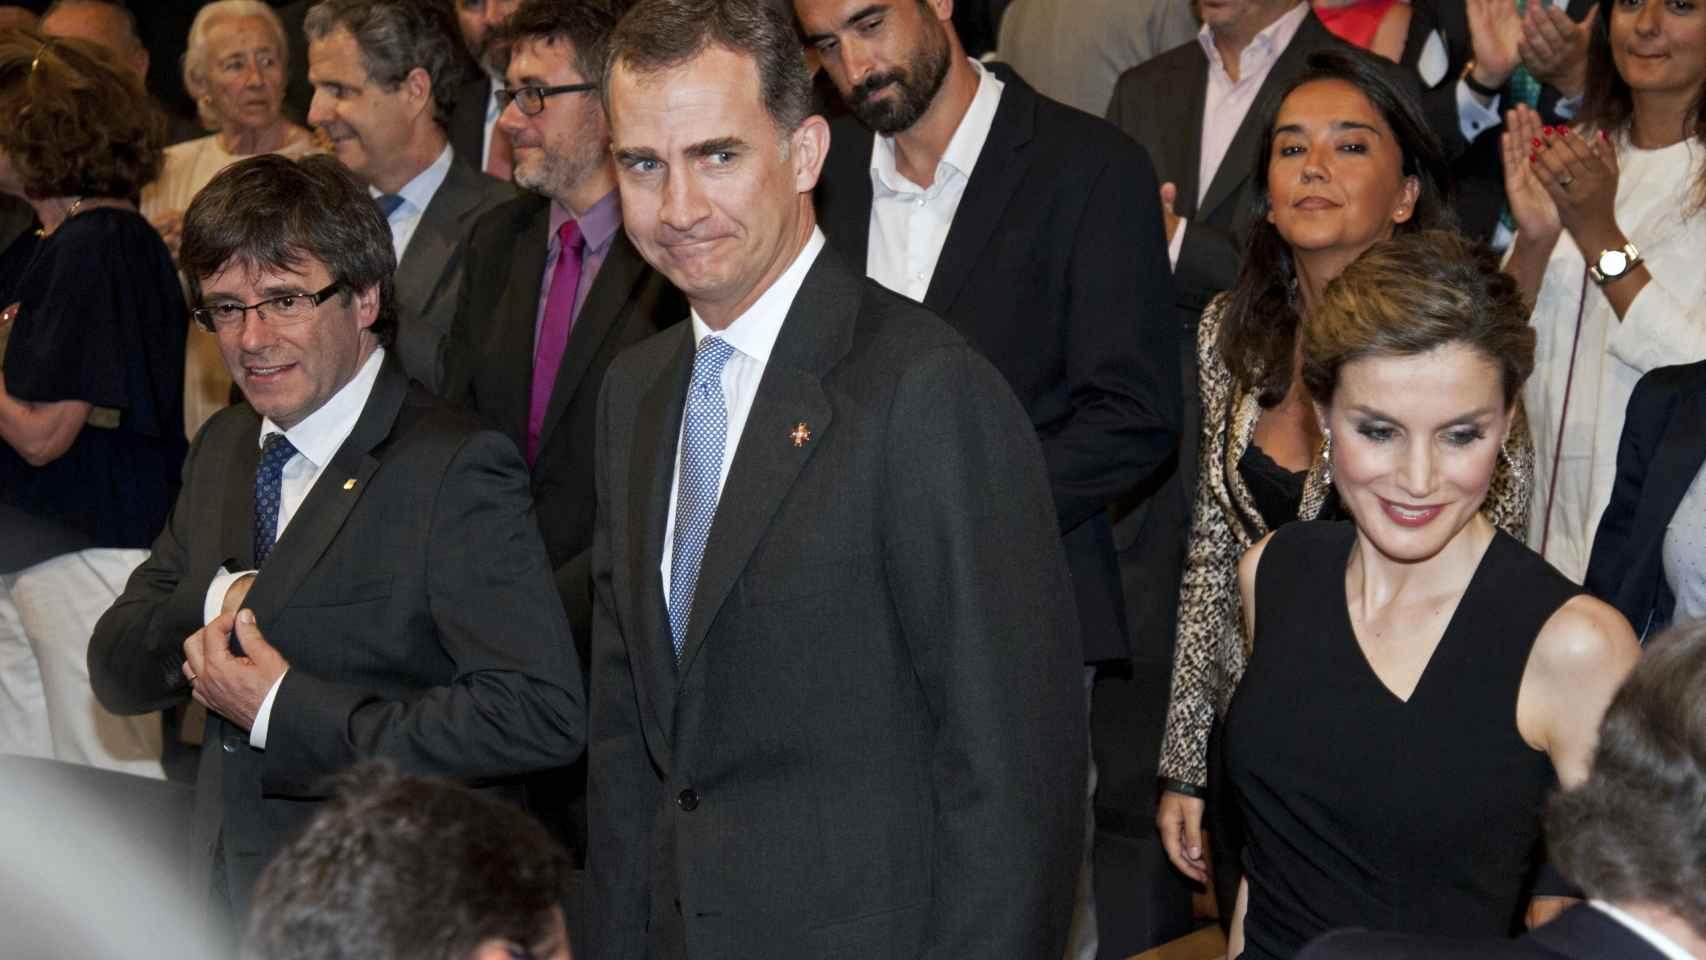 Los reyes posan junto a Carles Puigdemont en Girona.